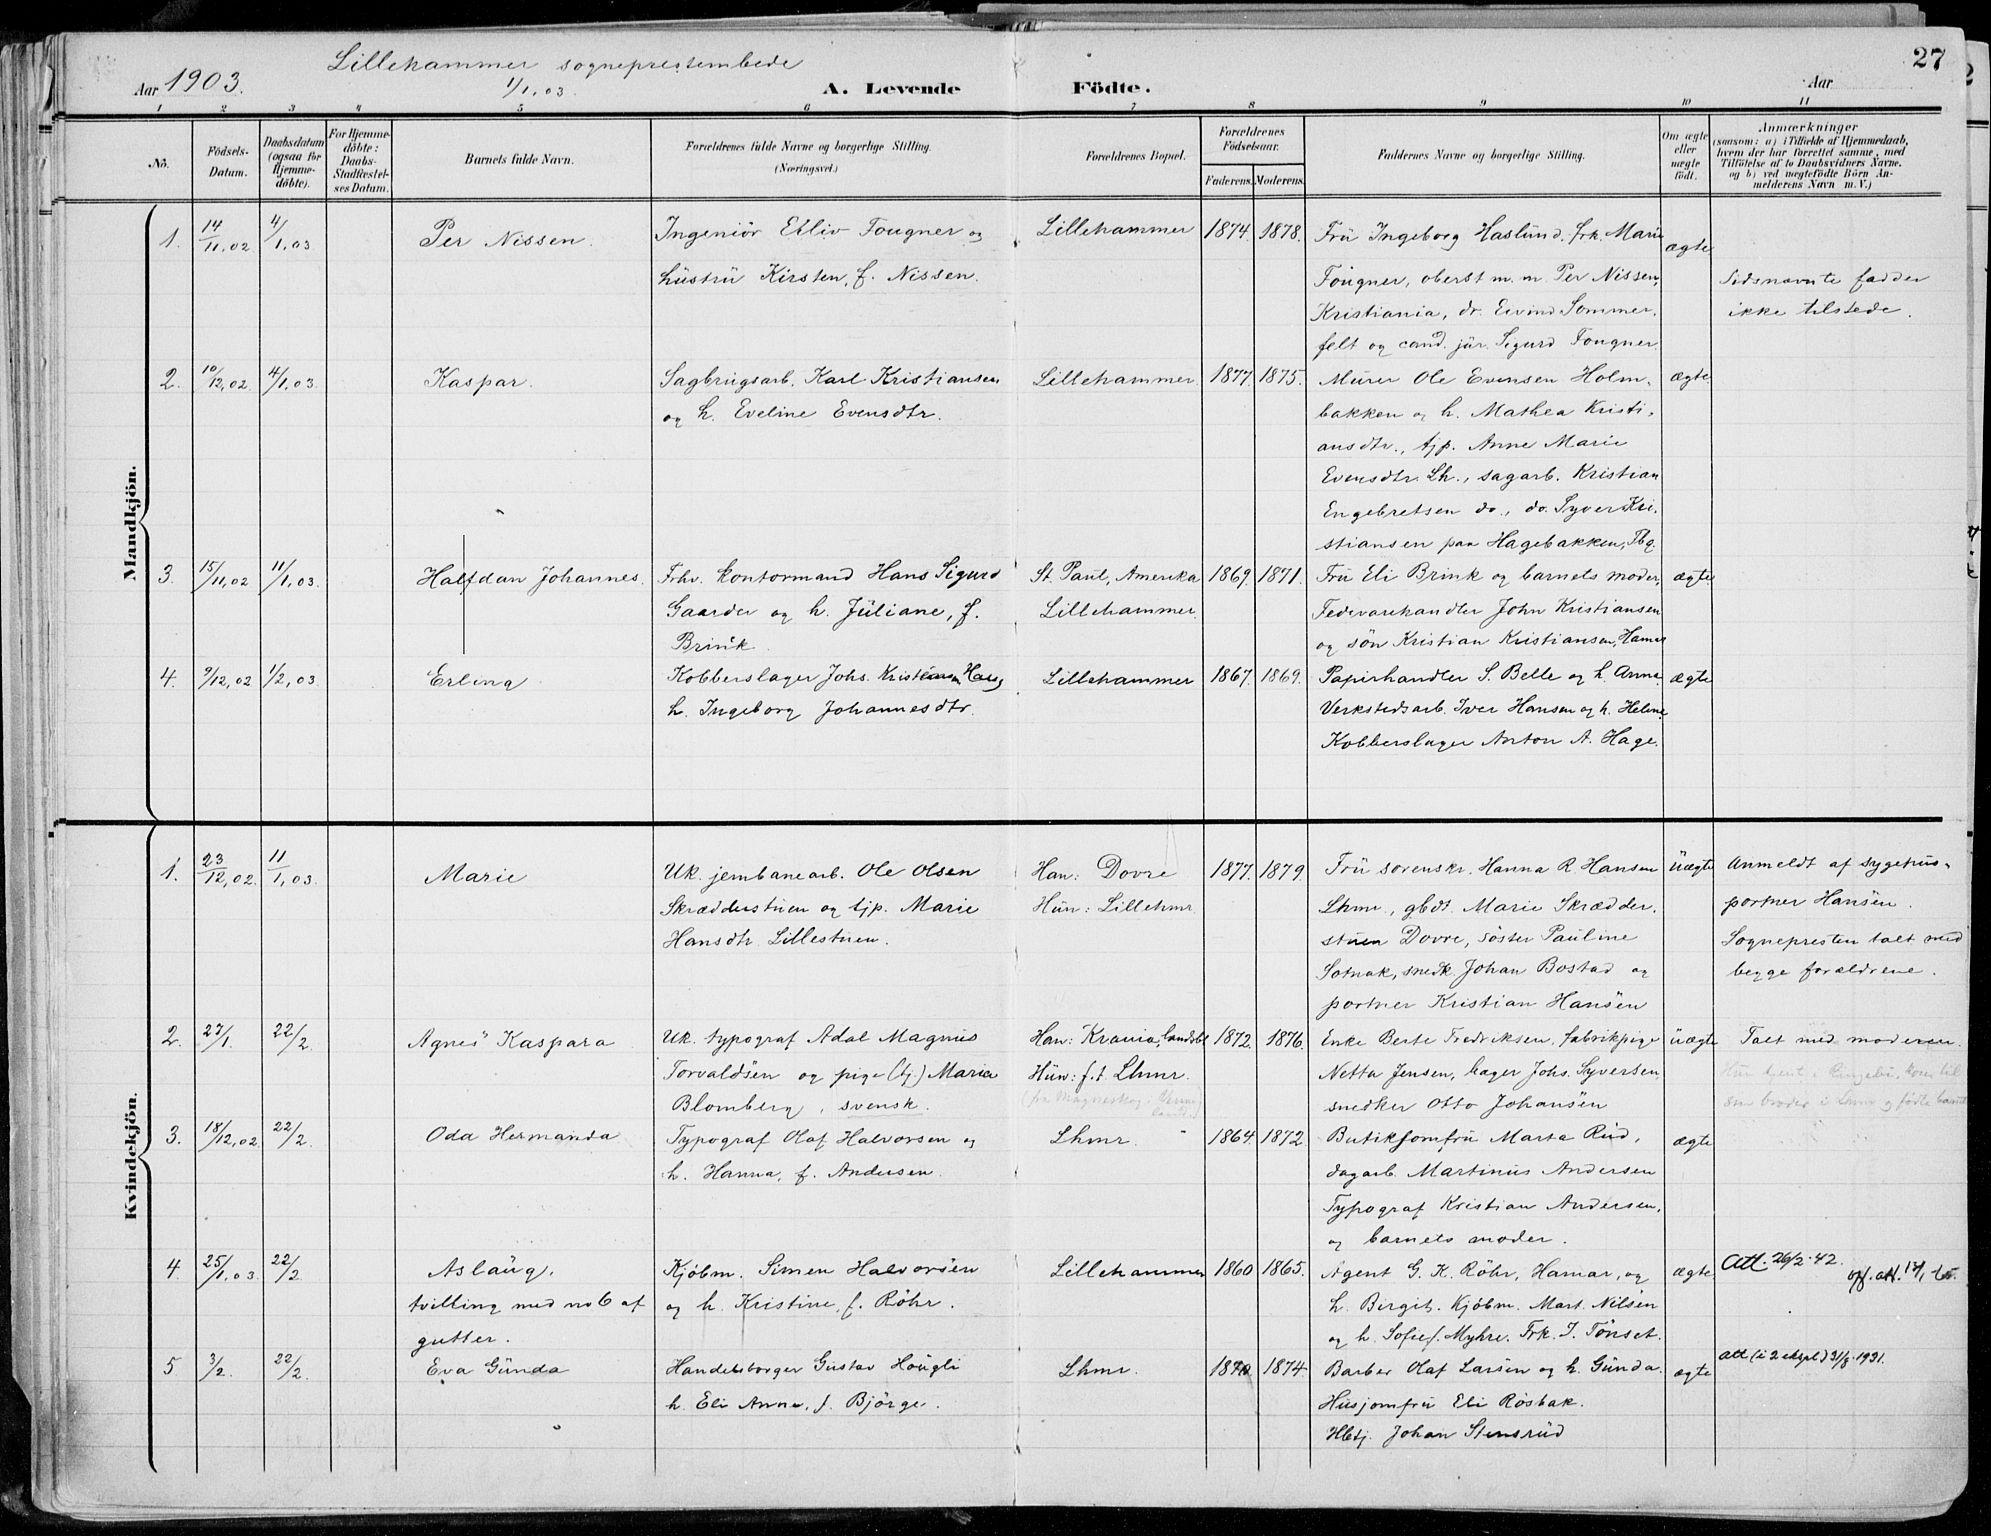 SAH, Lillehammer prestekontor, Ministerialbok nr. 1, 1901-1916, s. 27